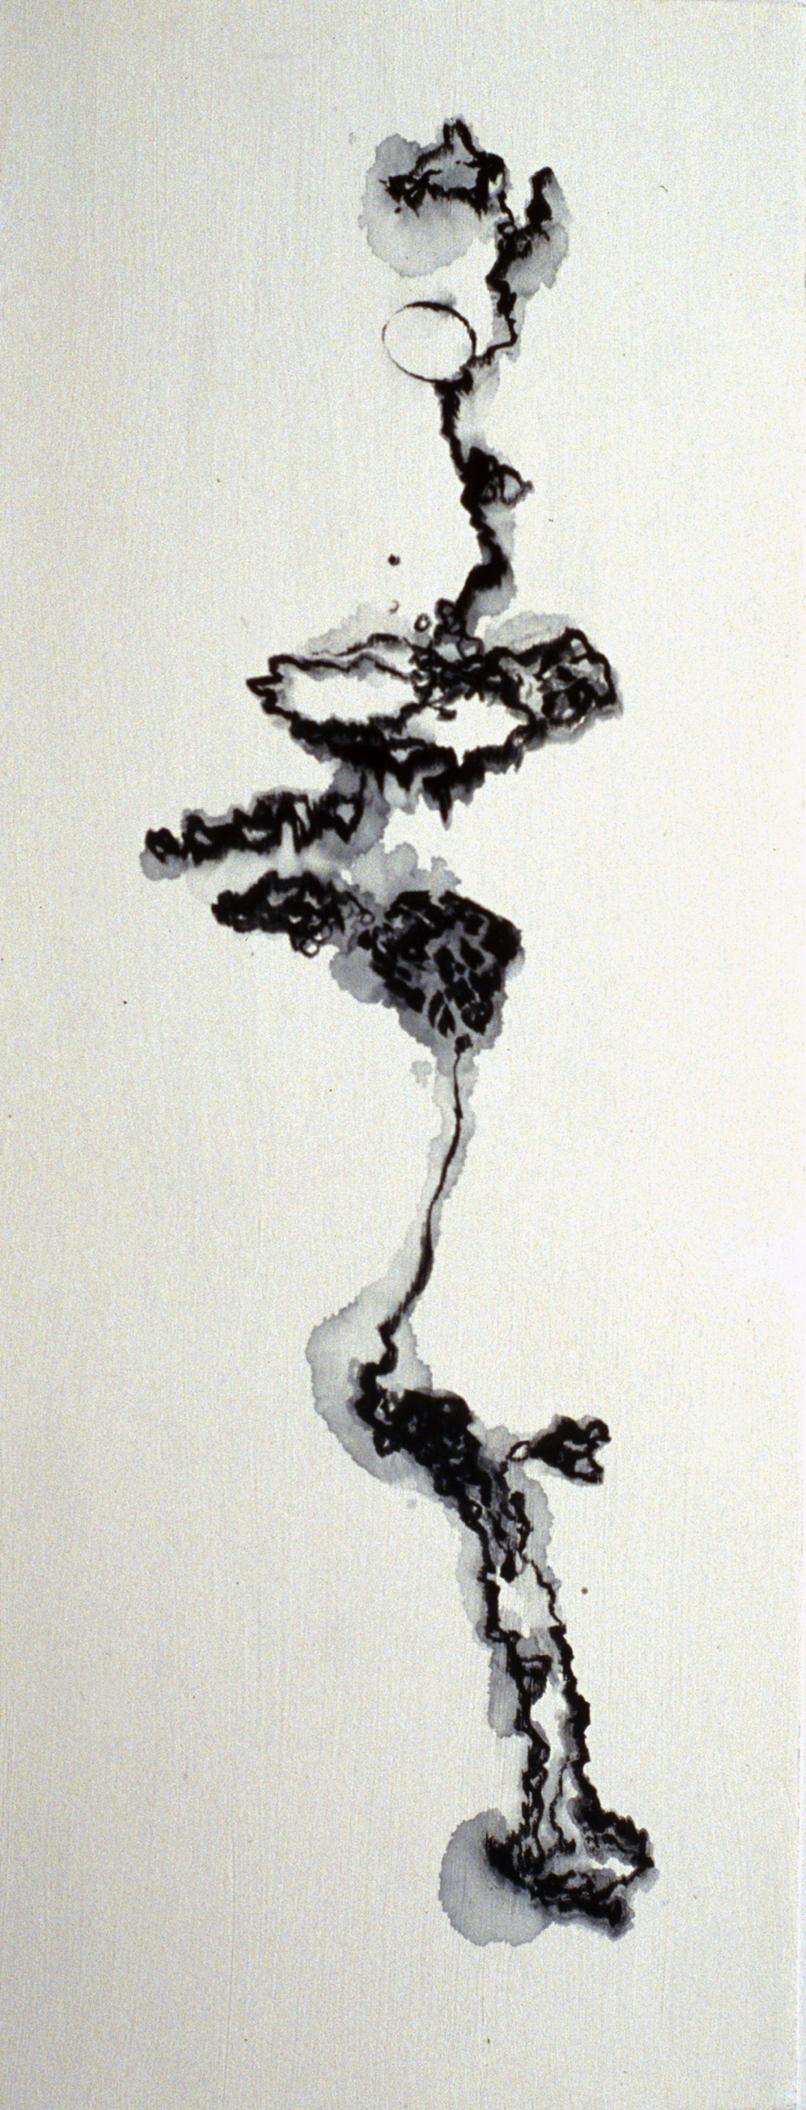 Hilda Shen,  One-line Landscape II , 2000. Pencil on paper, 16 ½ x 6 ¾ inches, ©Hilda Shen, courtesy of Fou Gallery